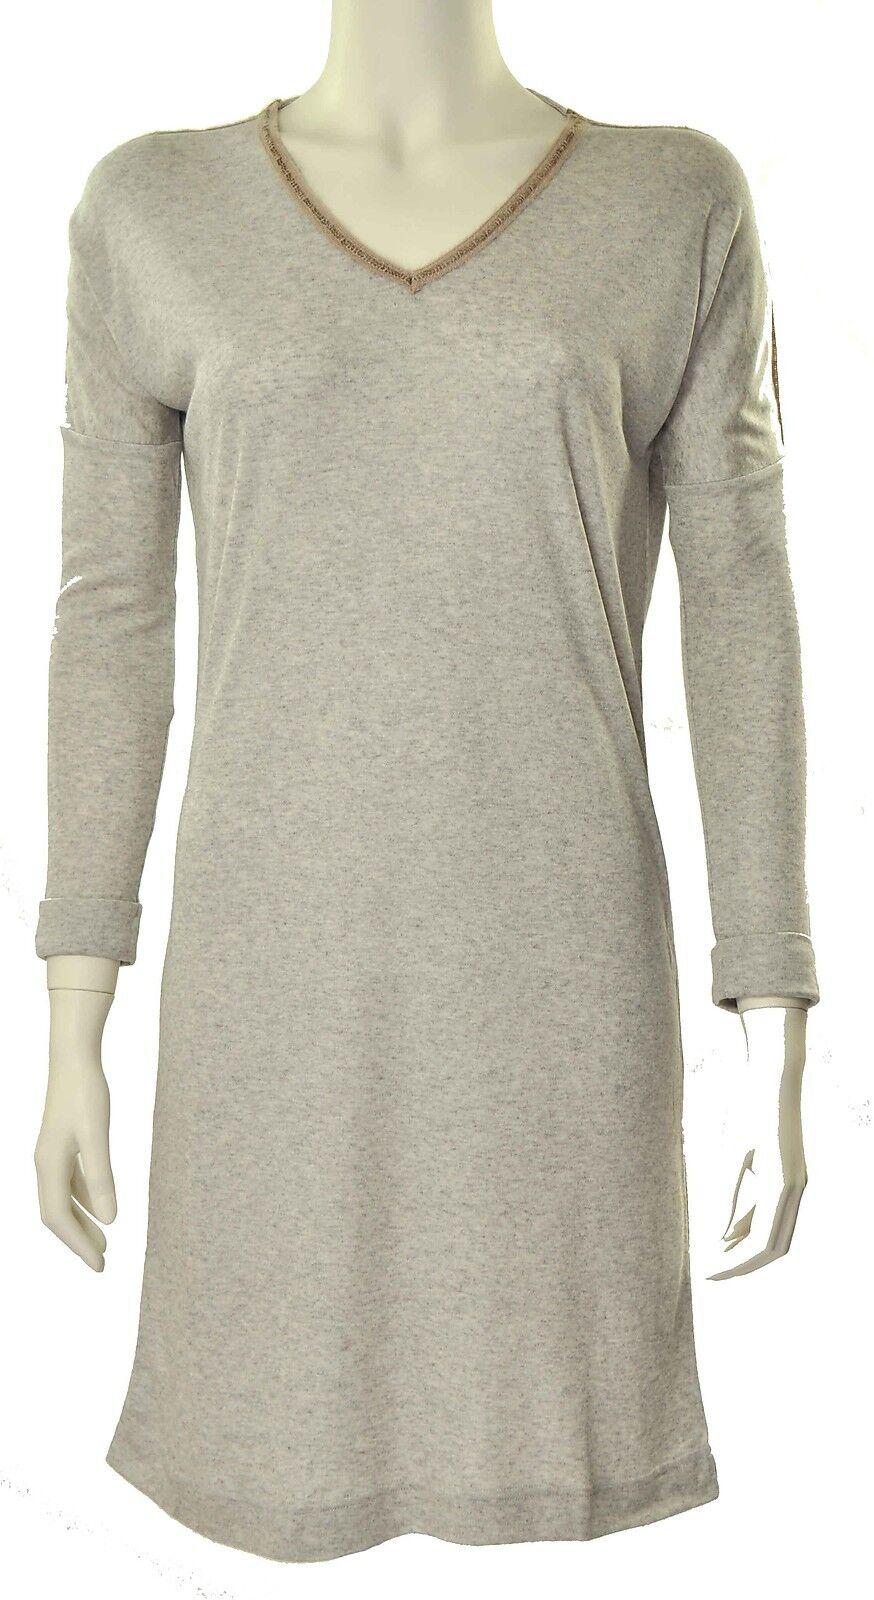 Sleepshirt Nachthemd Keiko Marke Pluto-  Modal Kaschmir- Fb sand grey- Gr 36- 46